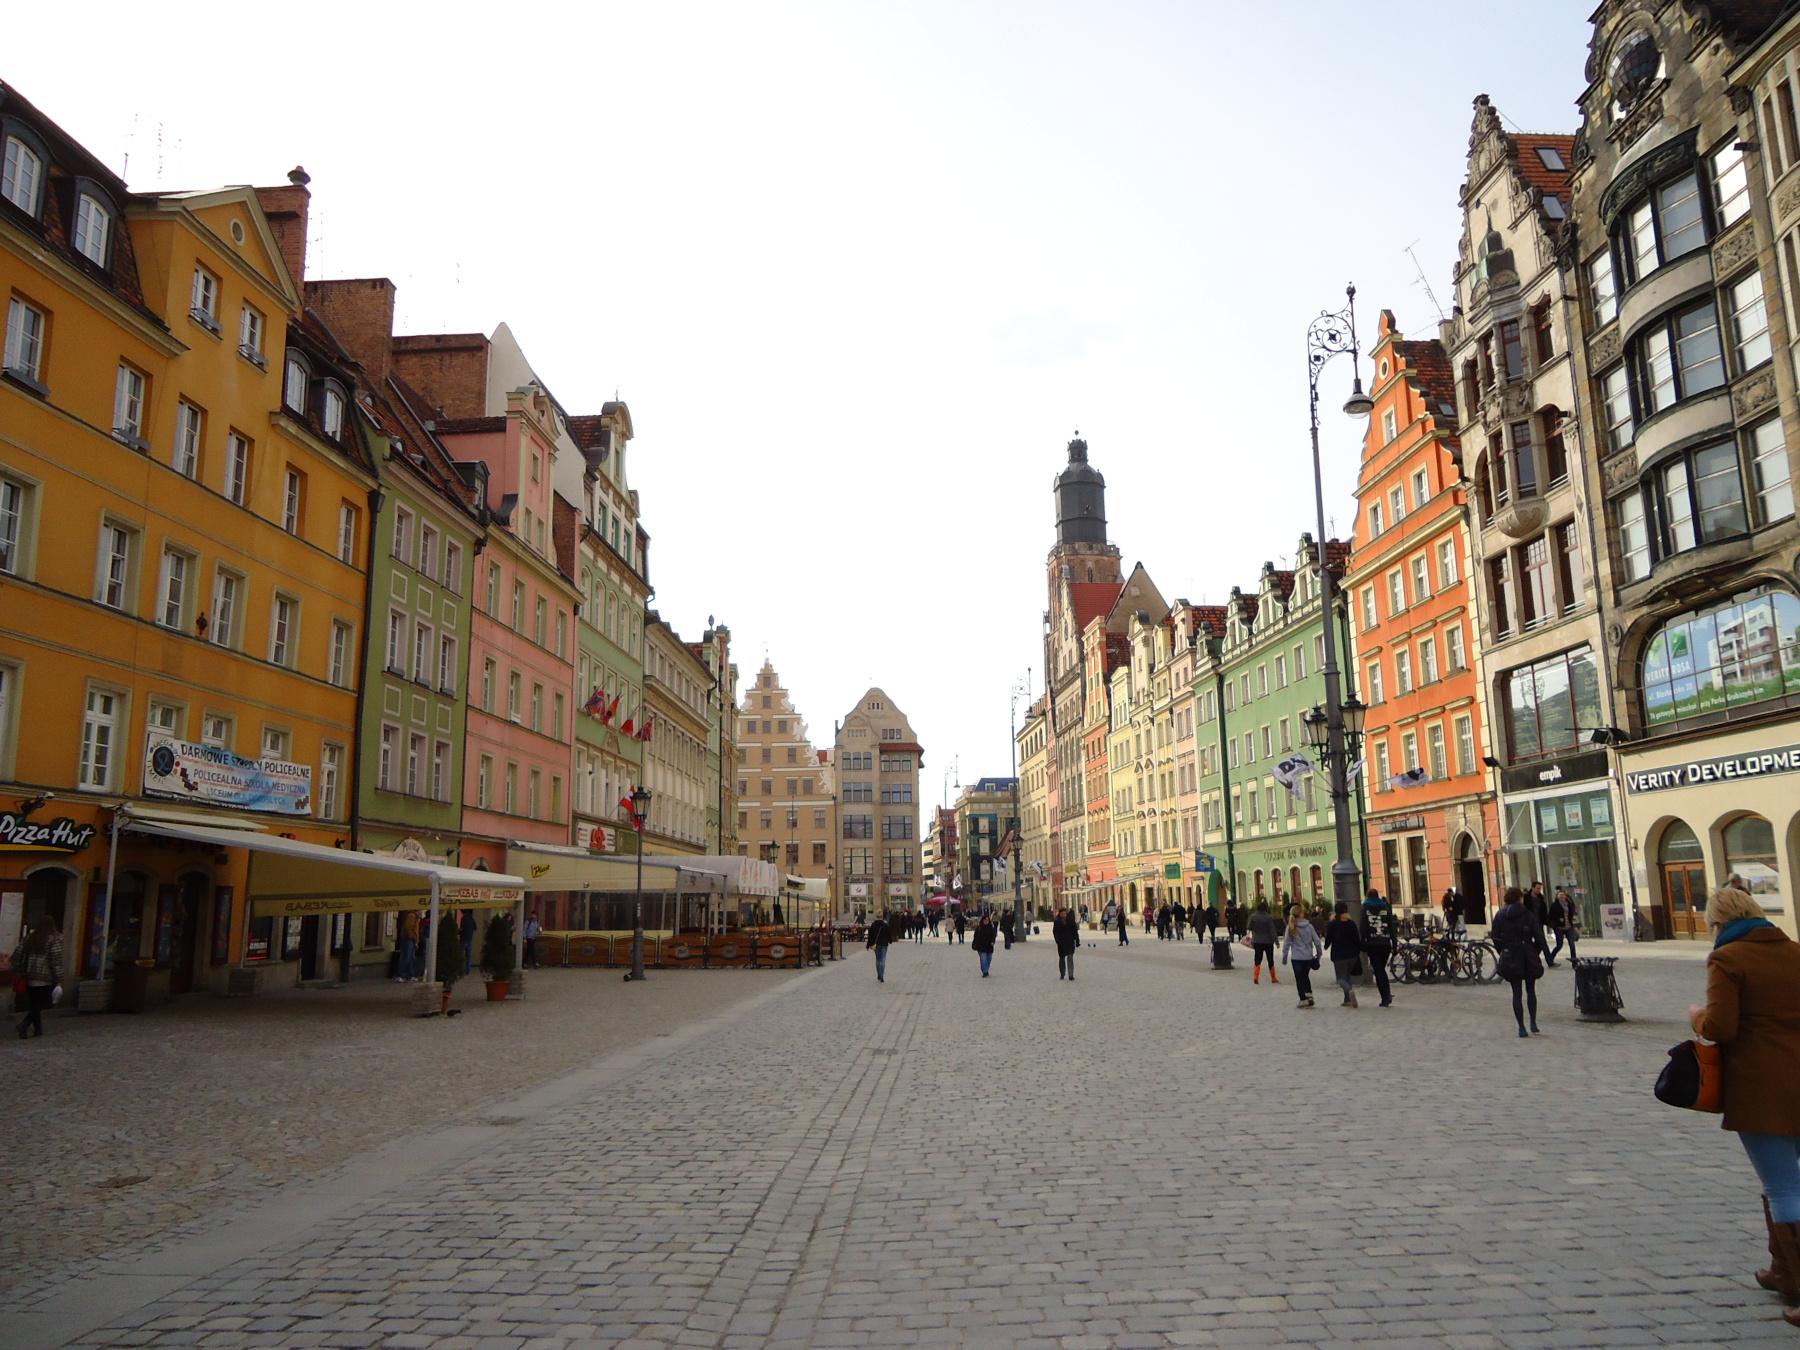 Рыночная площадь (Rynek we Wrocławiu)